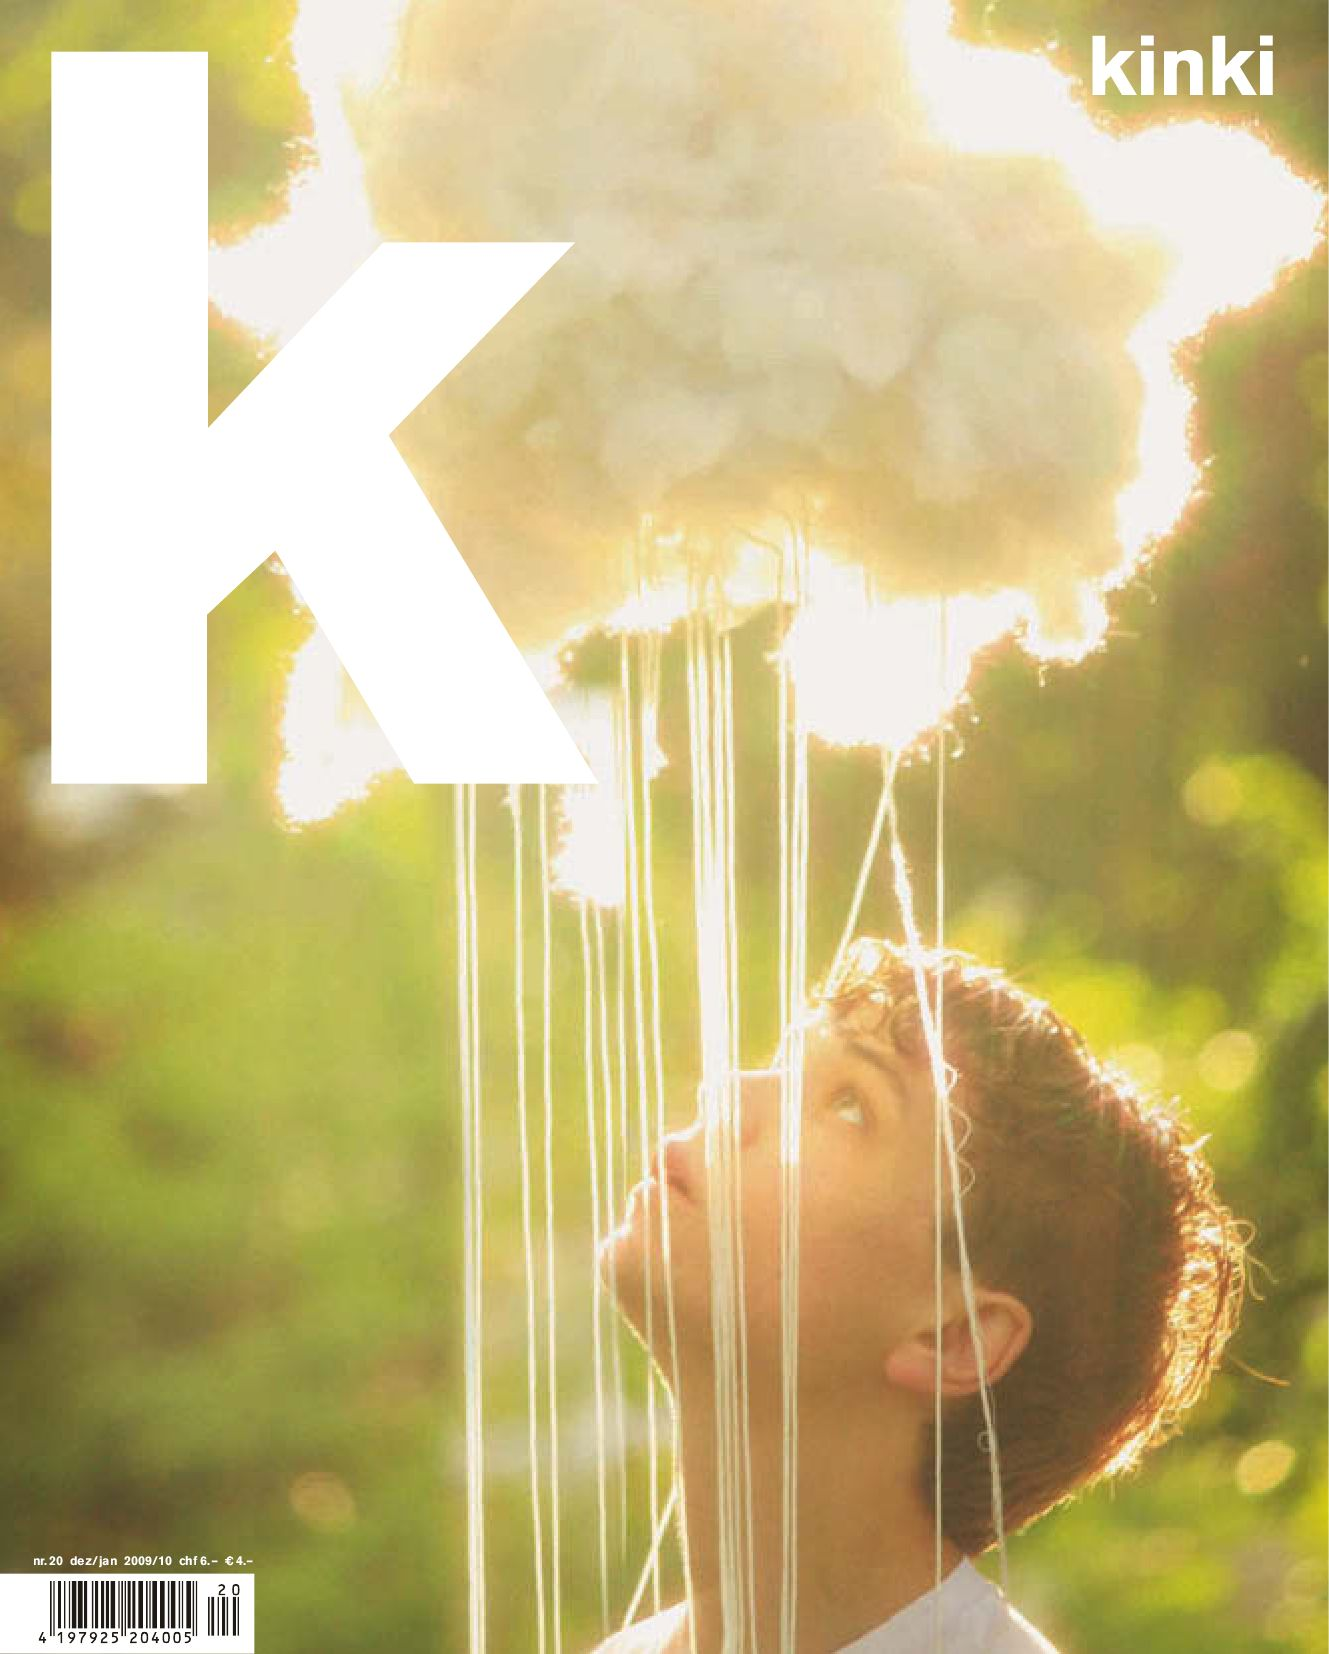 Kinki Magazin 20 By Kinkimag Issuu